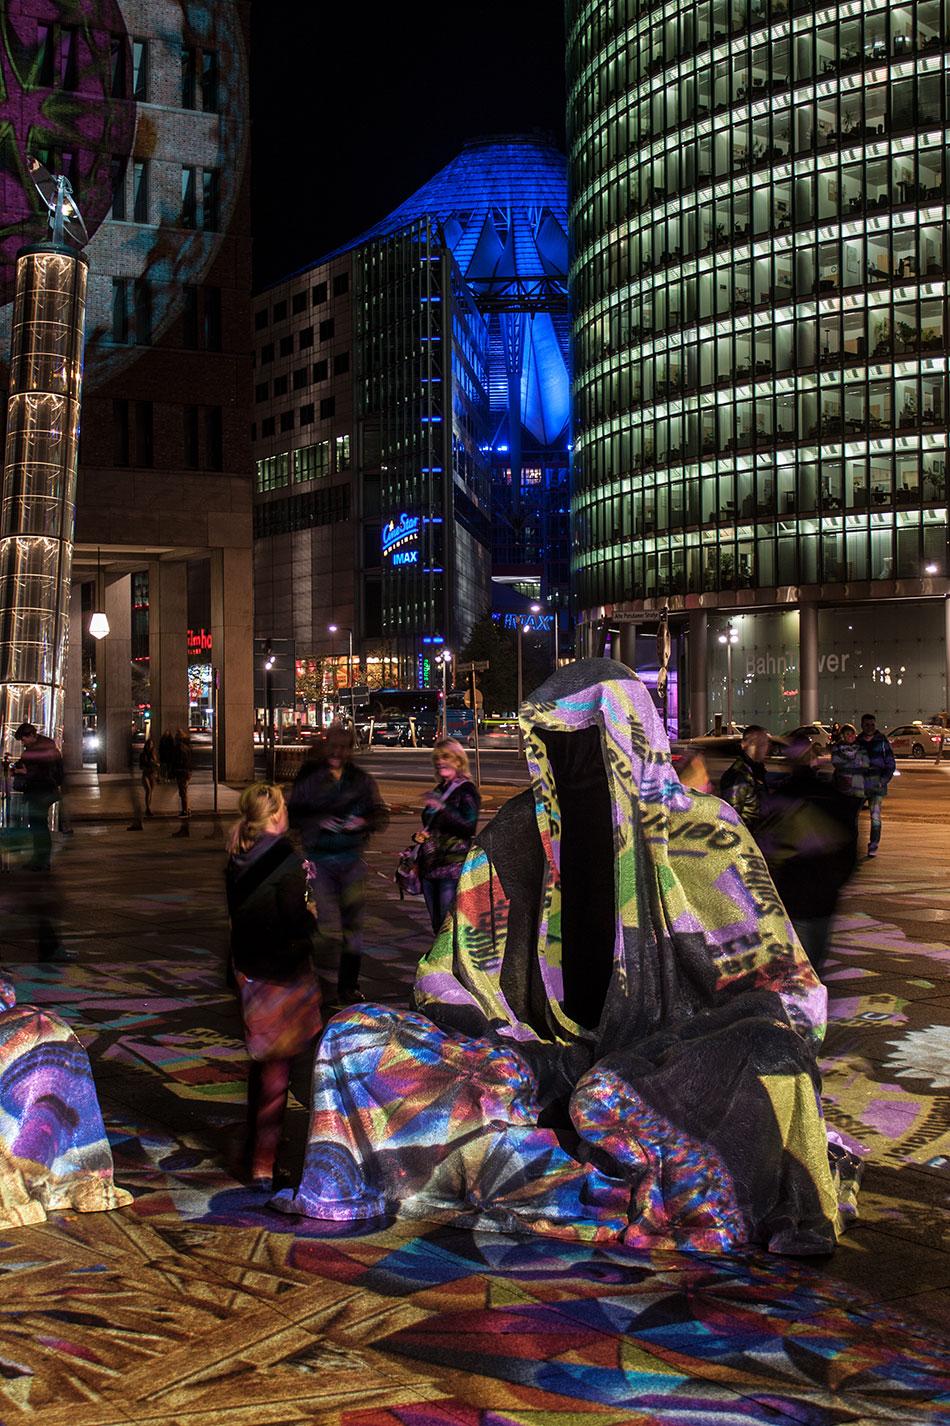 festival-of-lights-berlin-potzdamer-platz-light-art-show-exhibition-lumina-guardians-of-time-manfred-kili-kielnhofer-contemporary-arts-design-large-scale-monumental-public-sculpture-3670